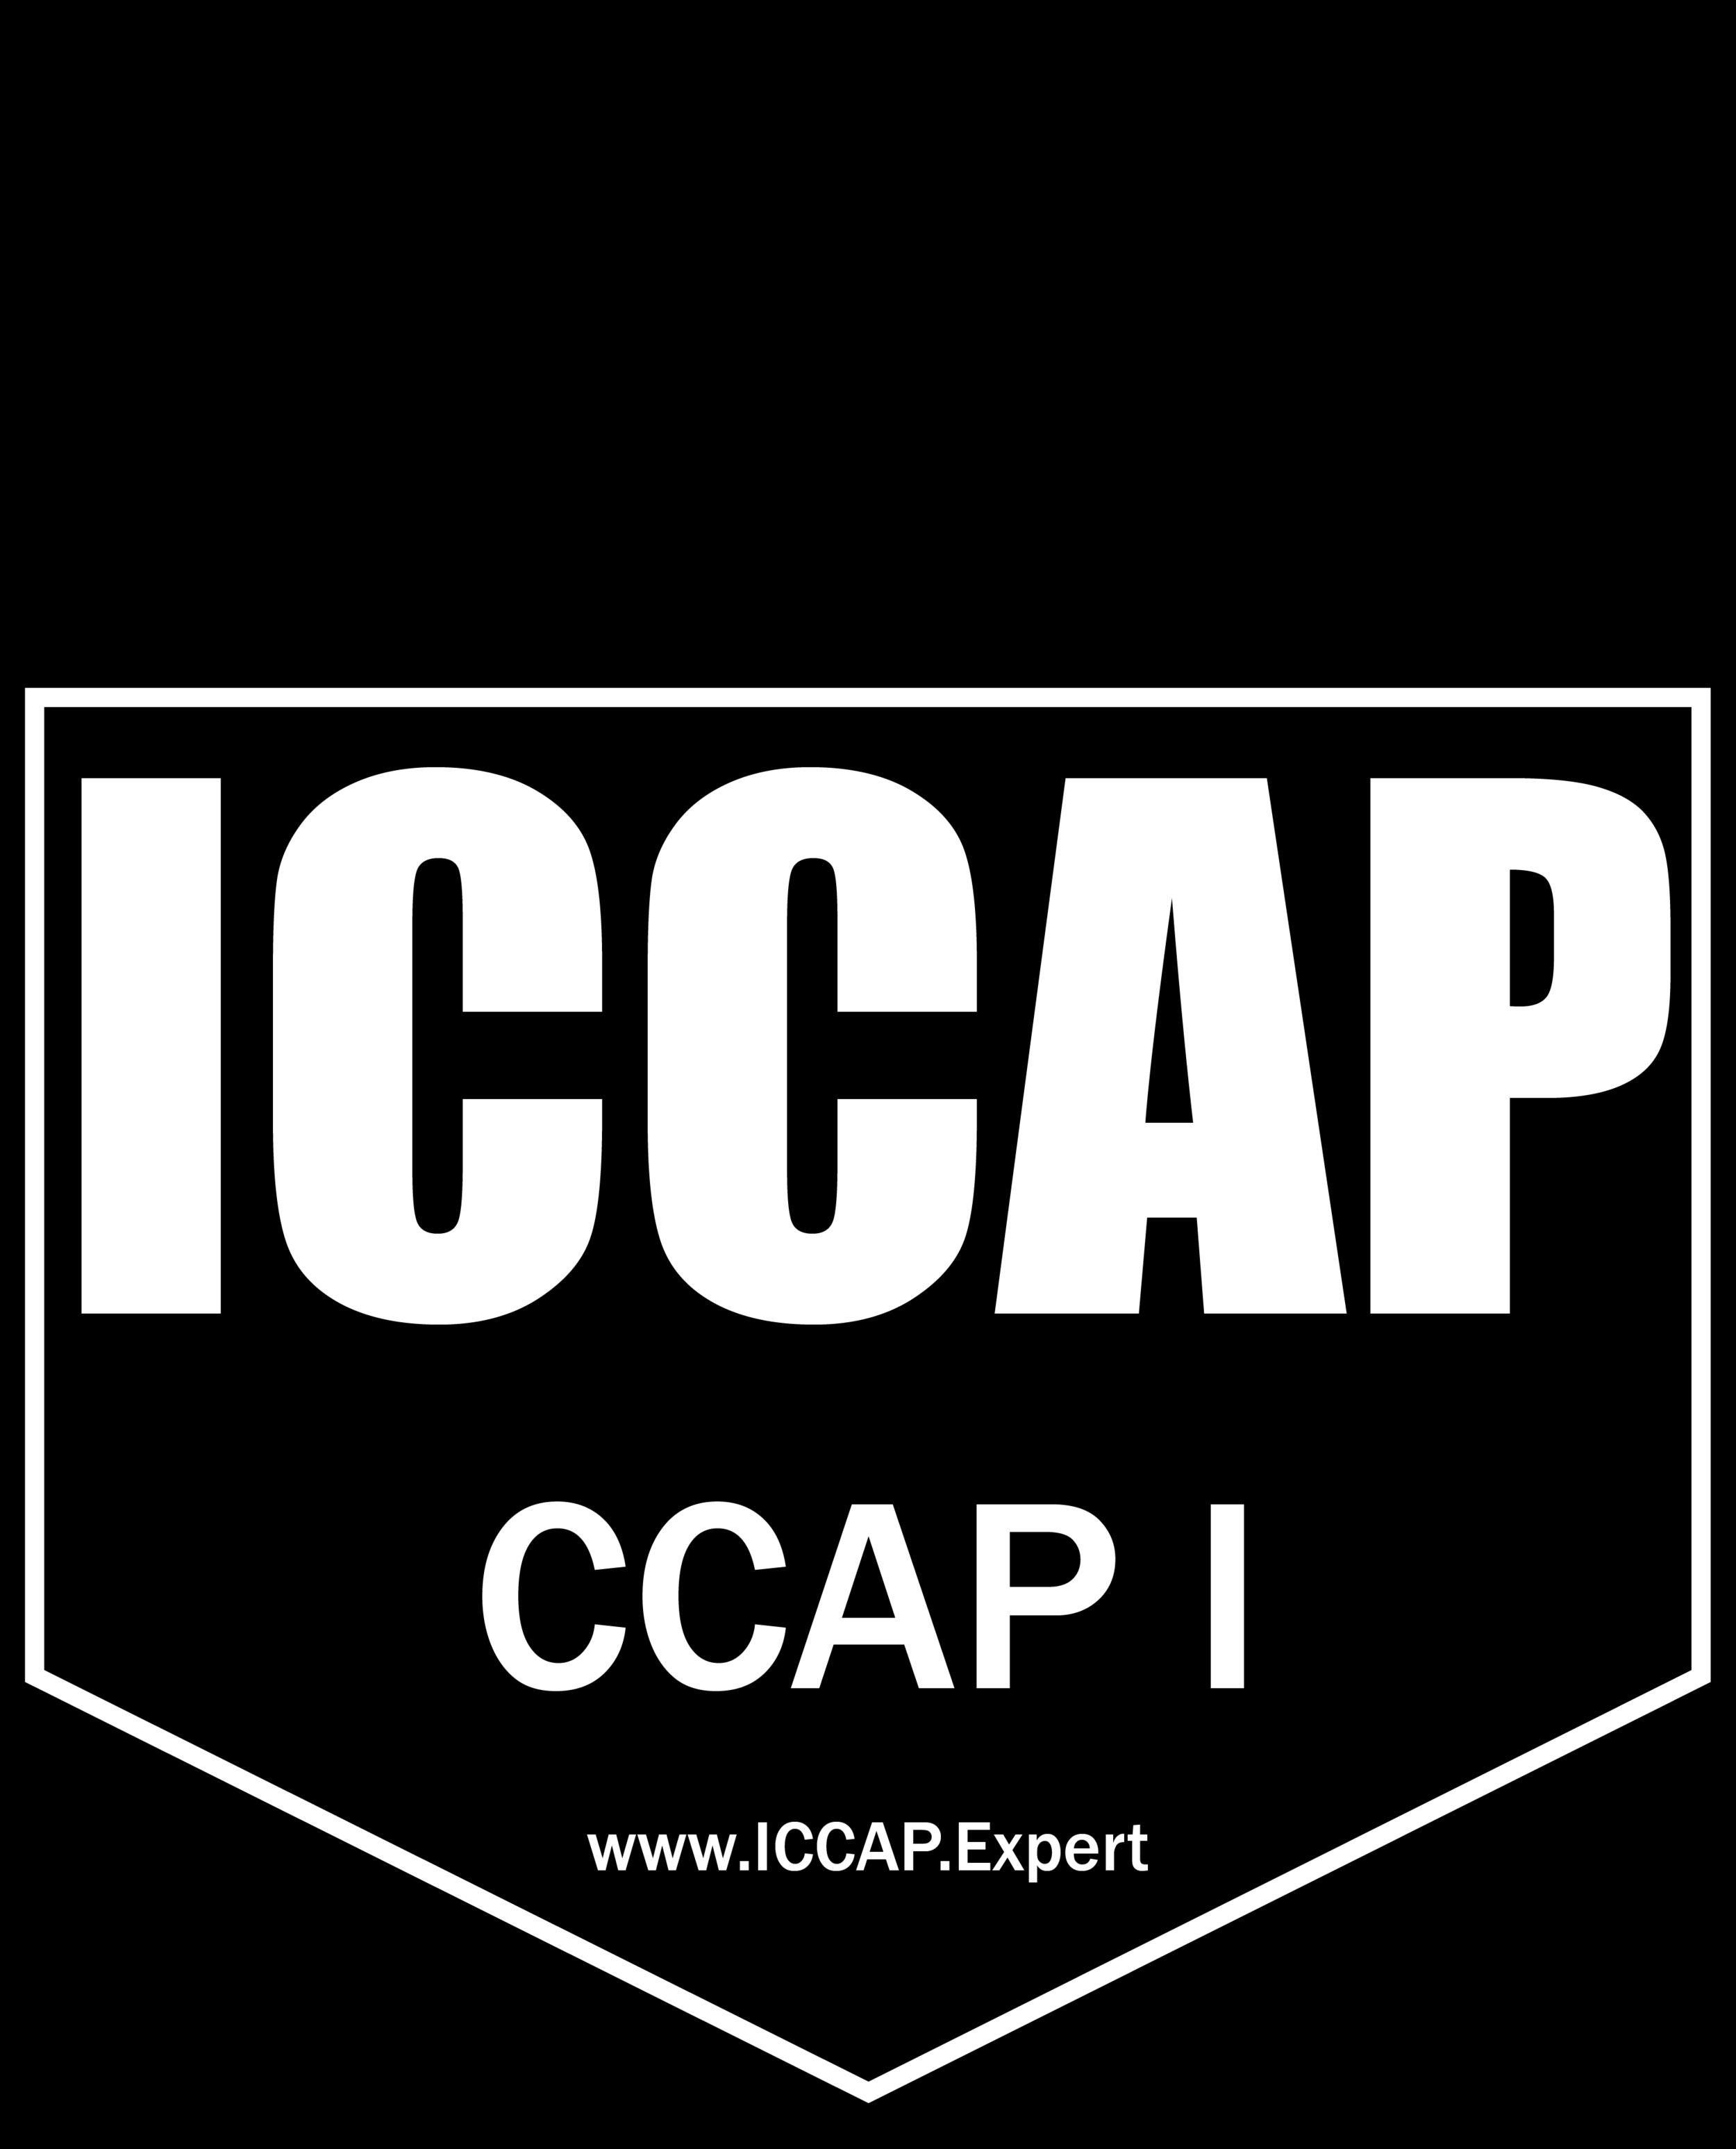 iccap-ccap-I-advocacy-marketing-certification.png